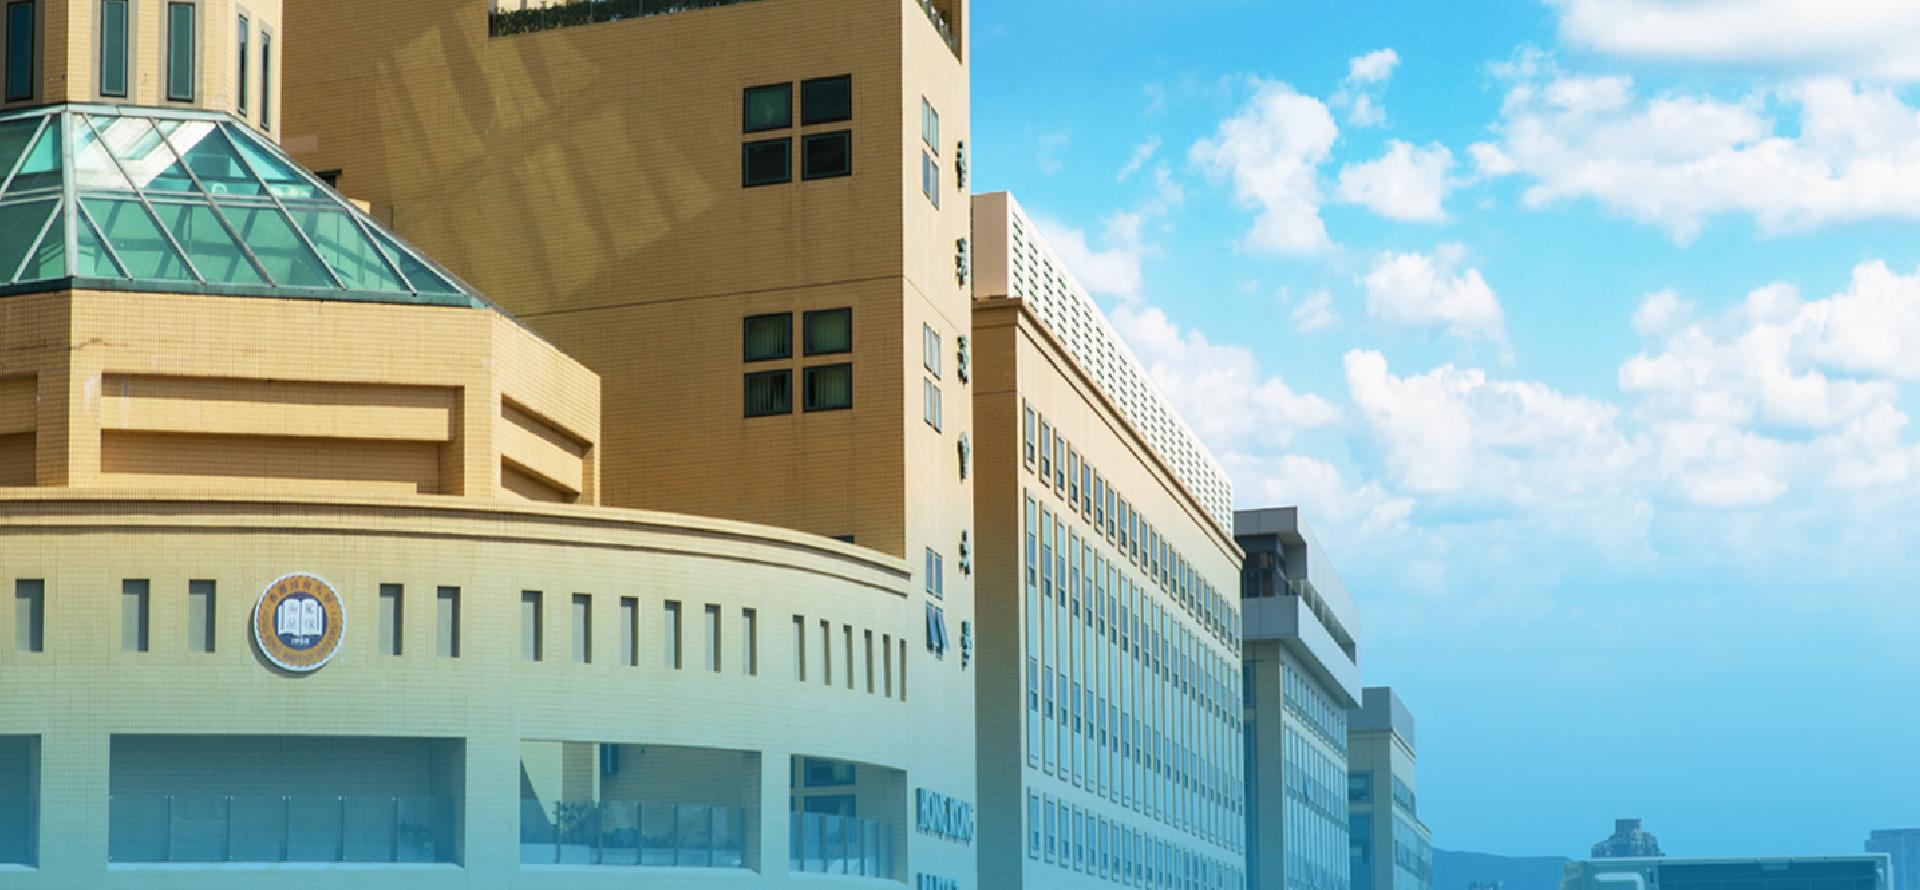 International Business Degree >> HKBU Admissions Office